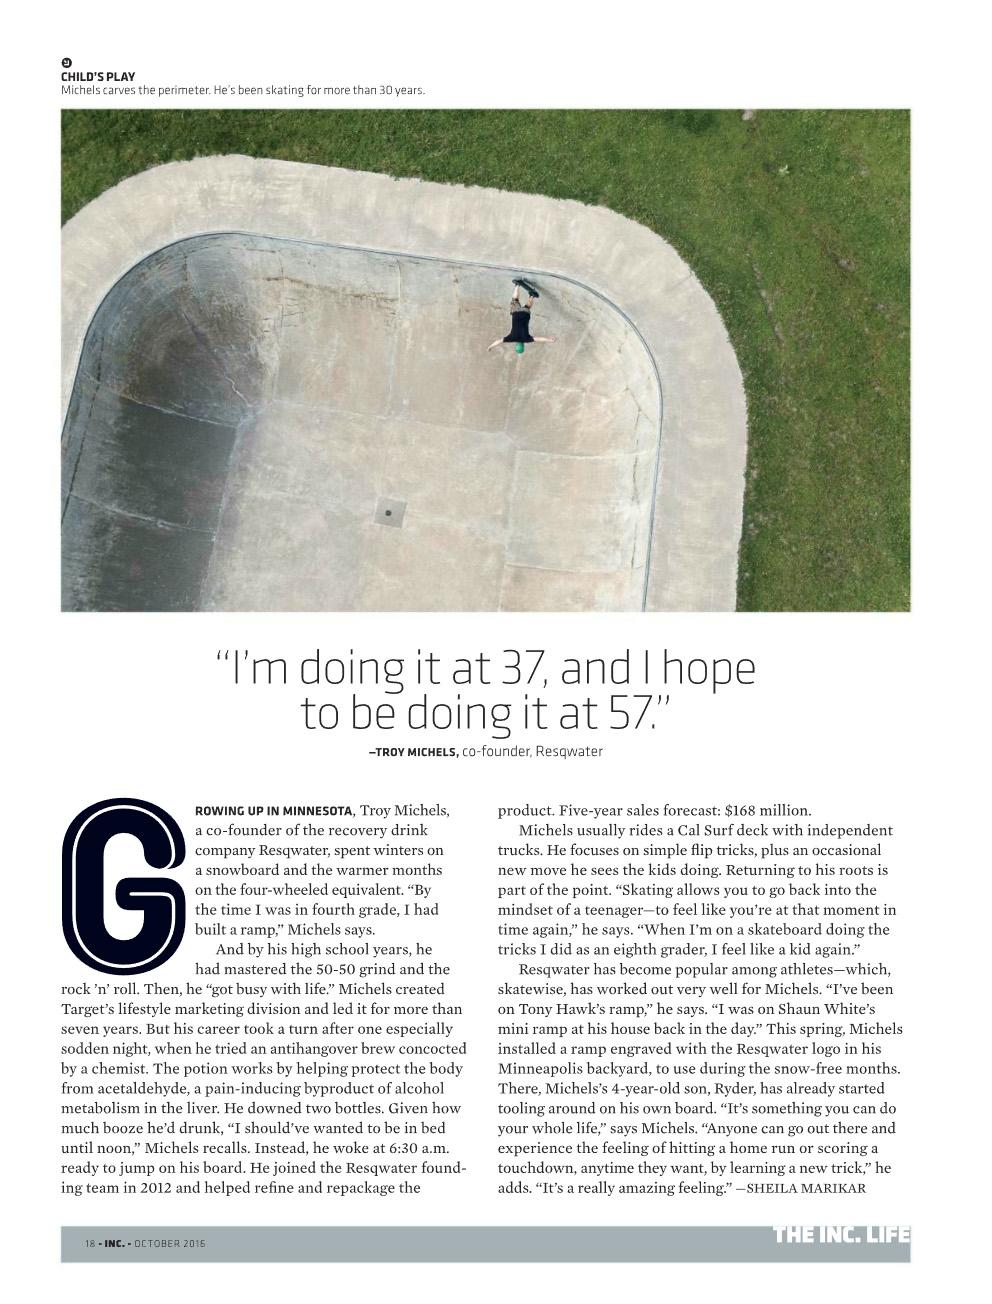 IncMagazine_Oct02.jpg